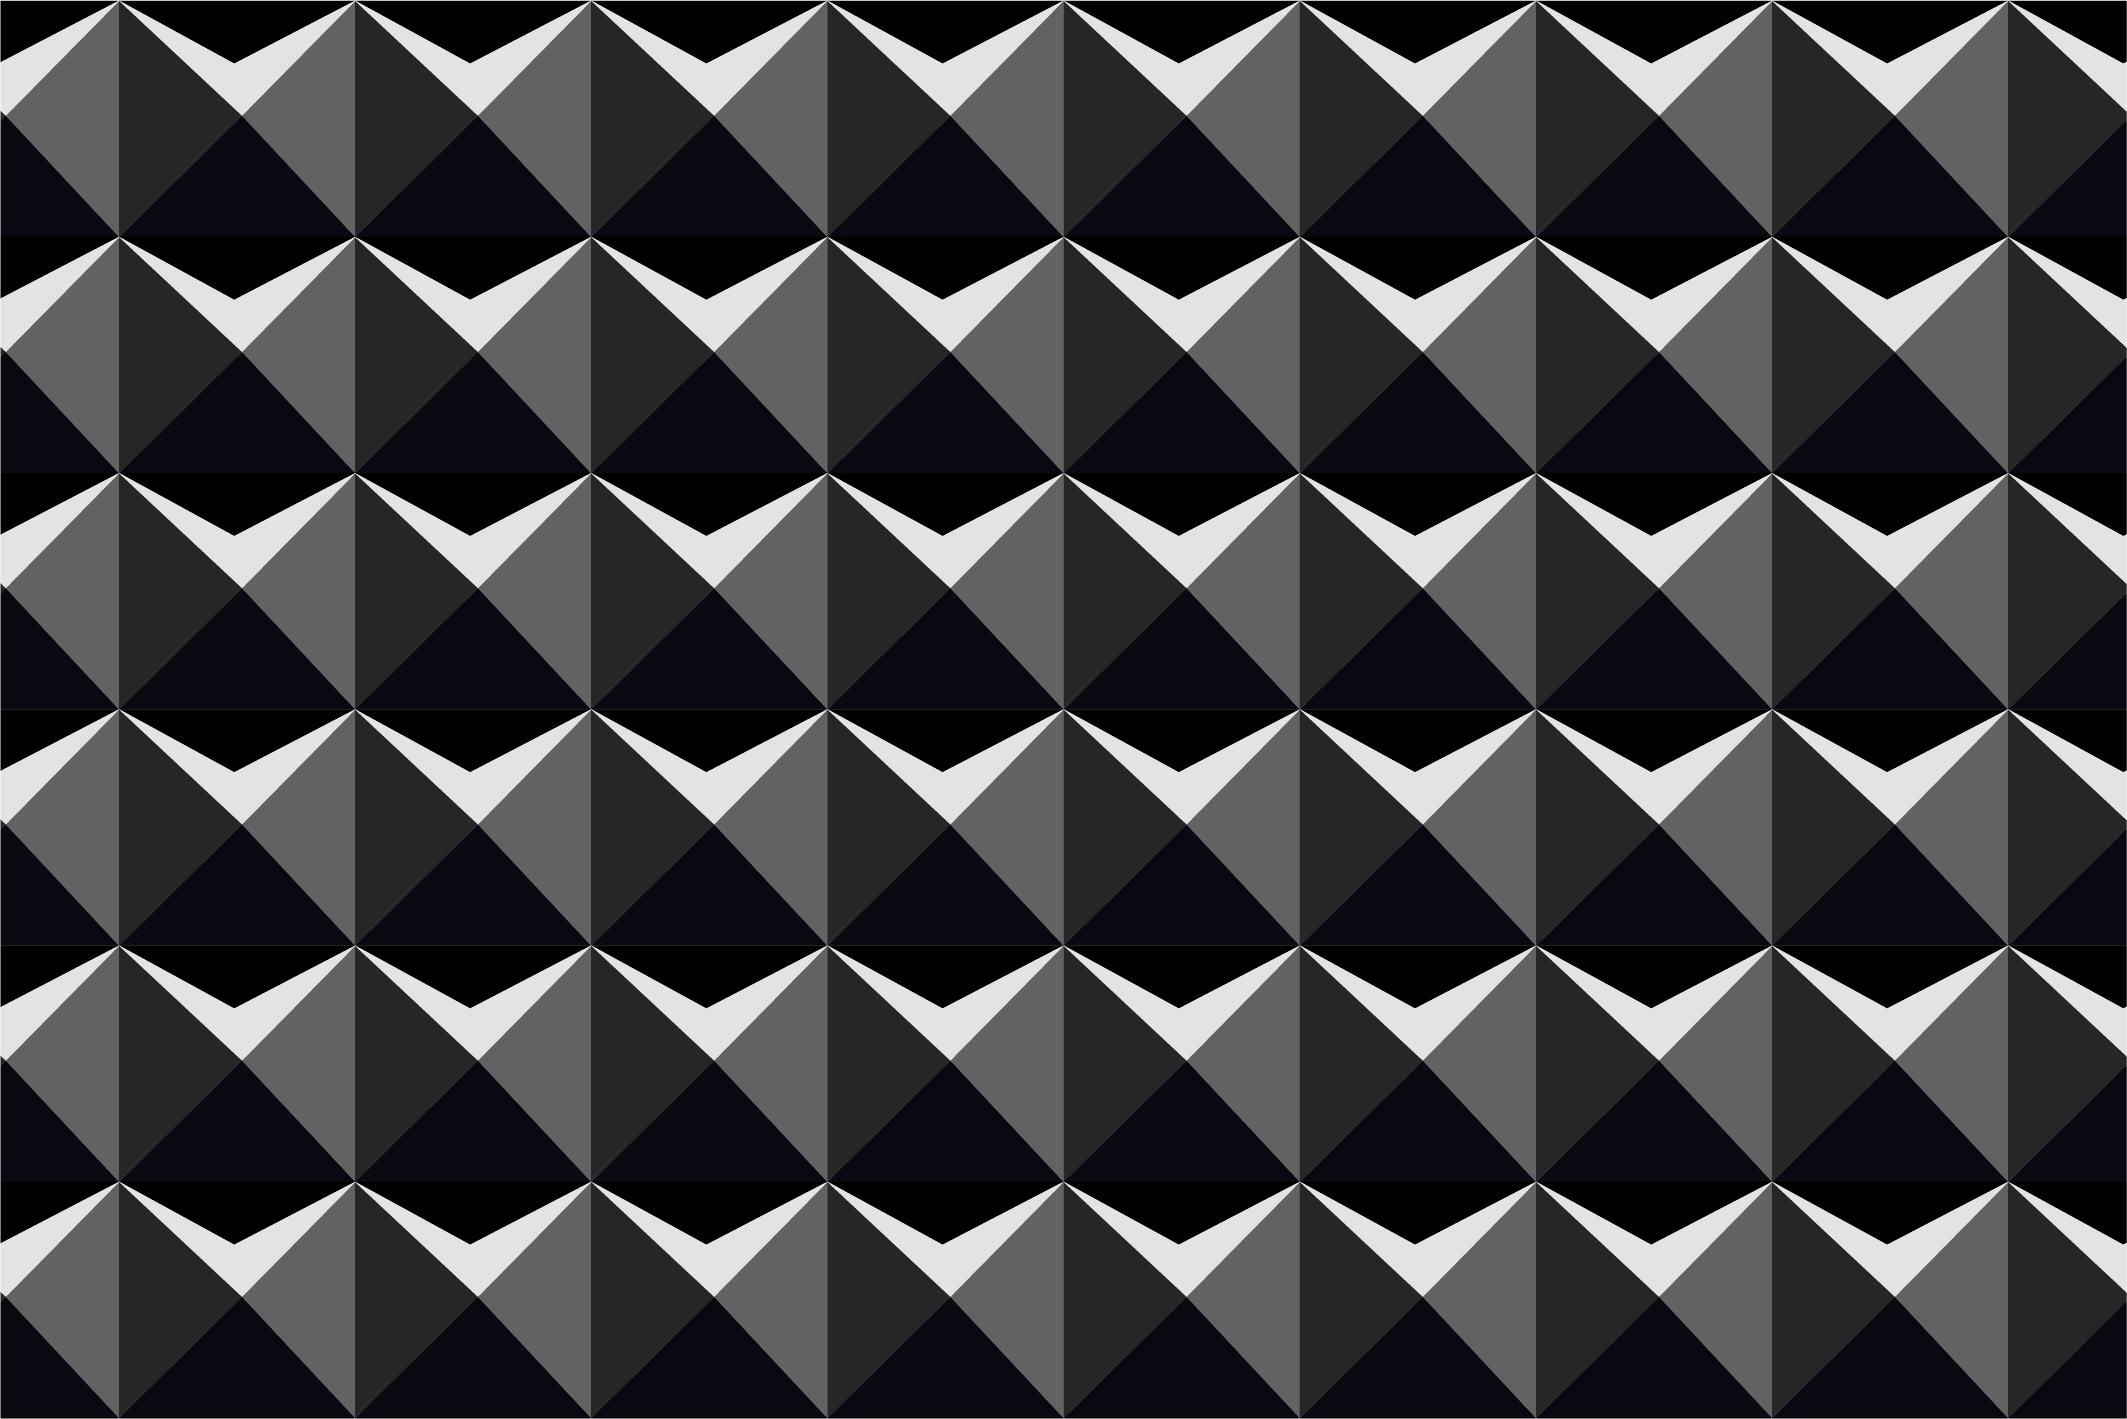 Dark seamless geometric textures example image 5